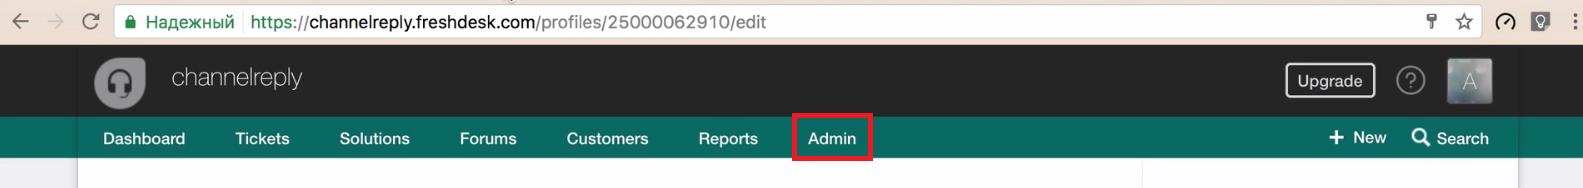 Admin Tab in Freshdesk